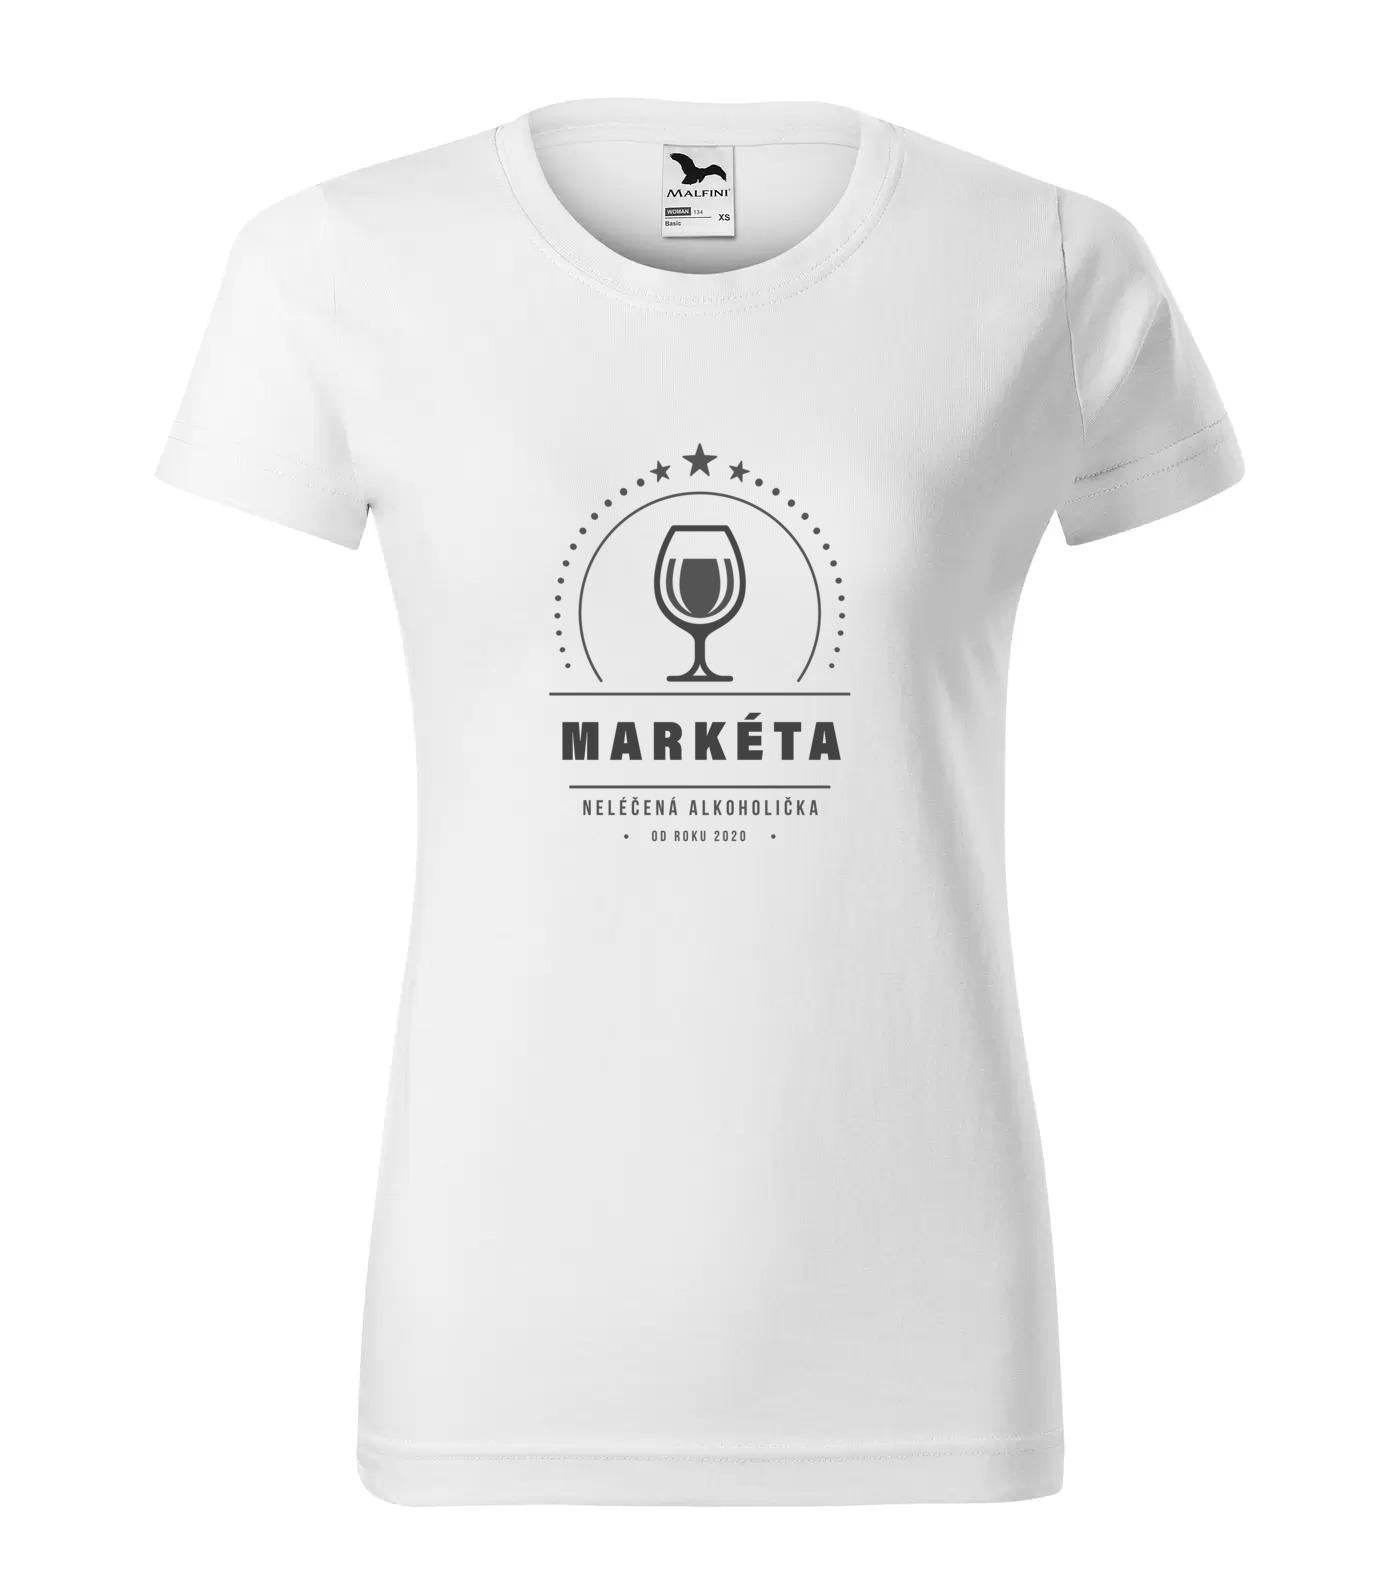 Tričko Alkoholička Markéta